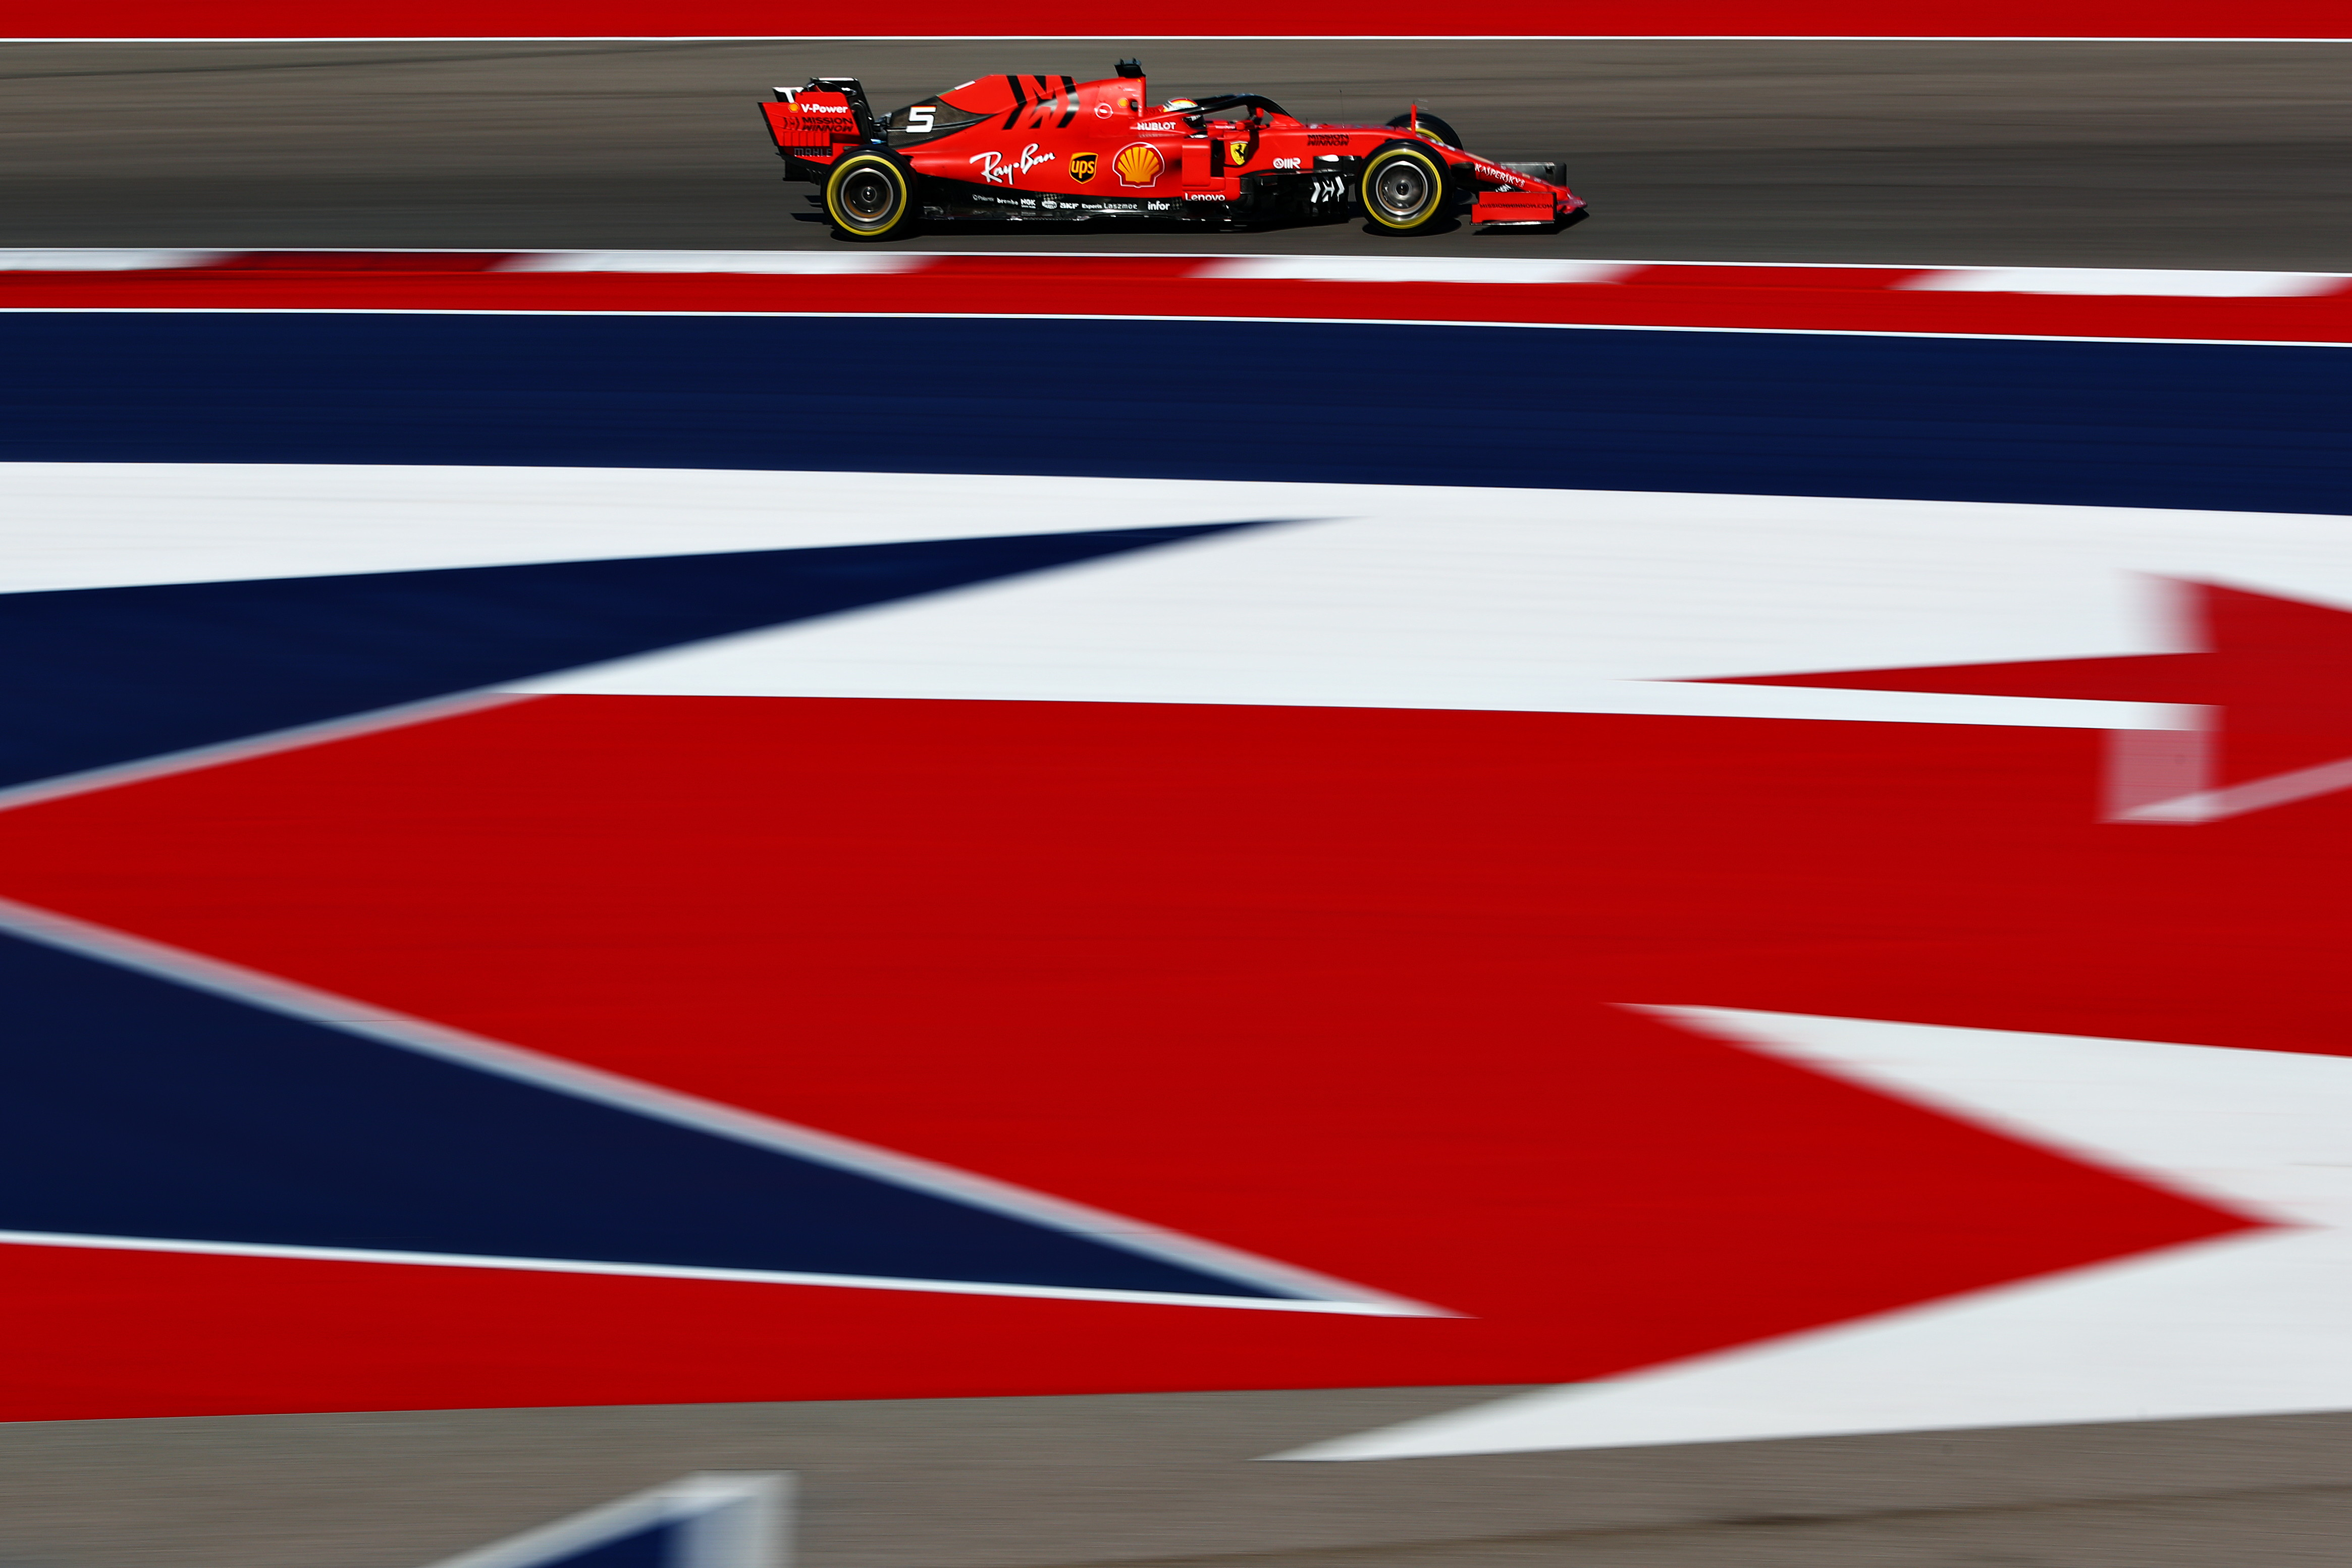 Venerdì di libere ad Austin, al pilota Mercedes basta un 8° posto per laurearsi aritmeticamente campione